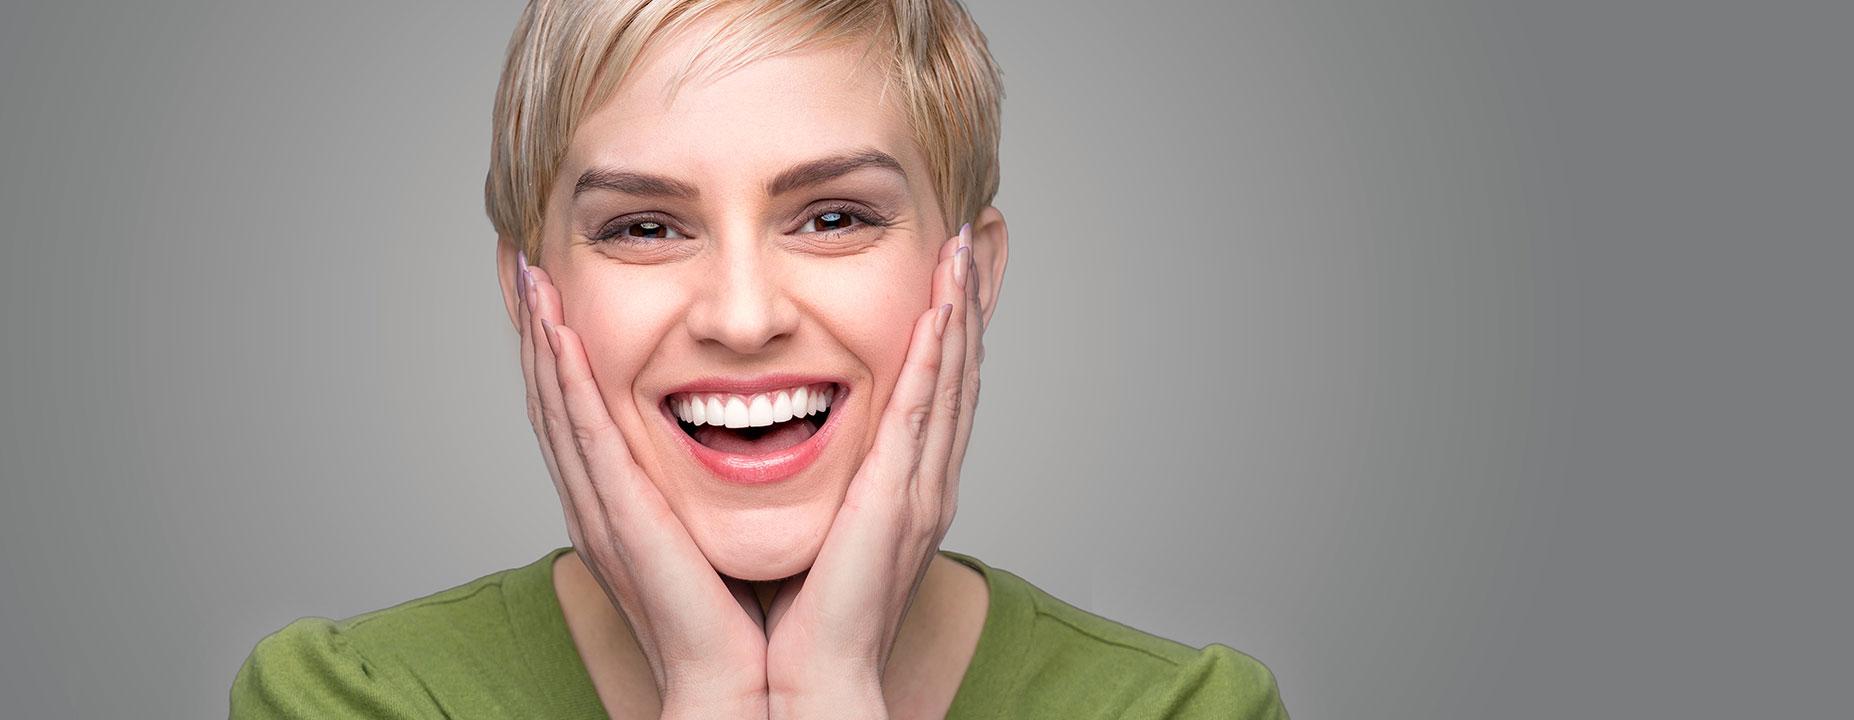 Happy lady with a dental bridge